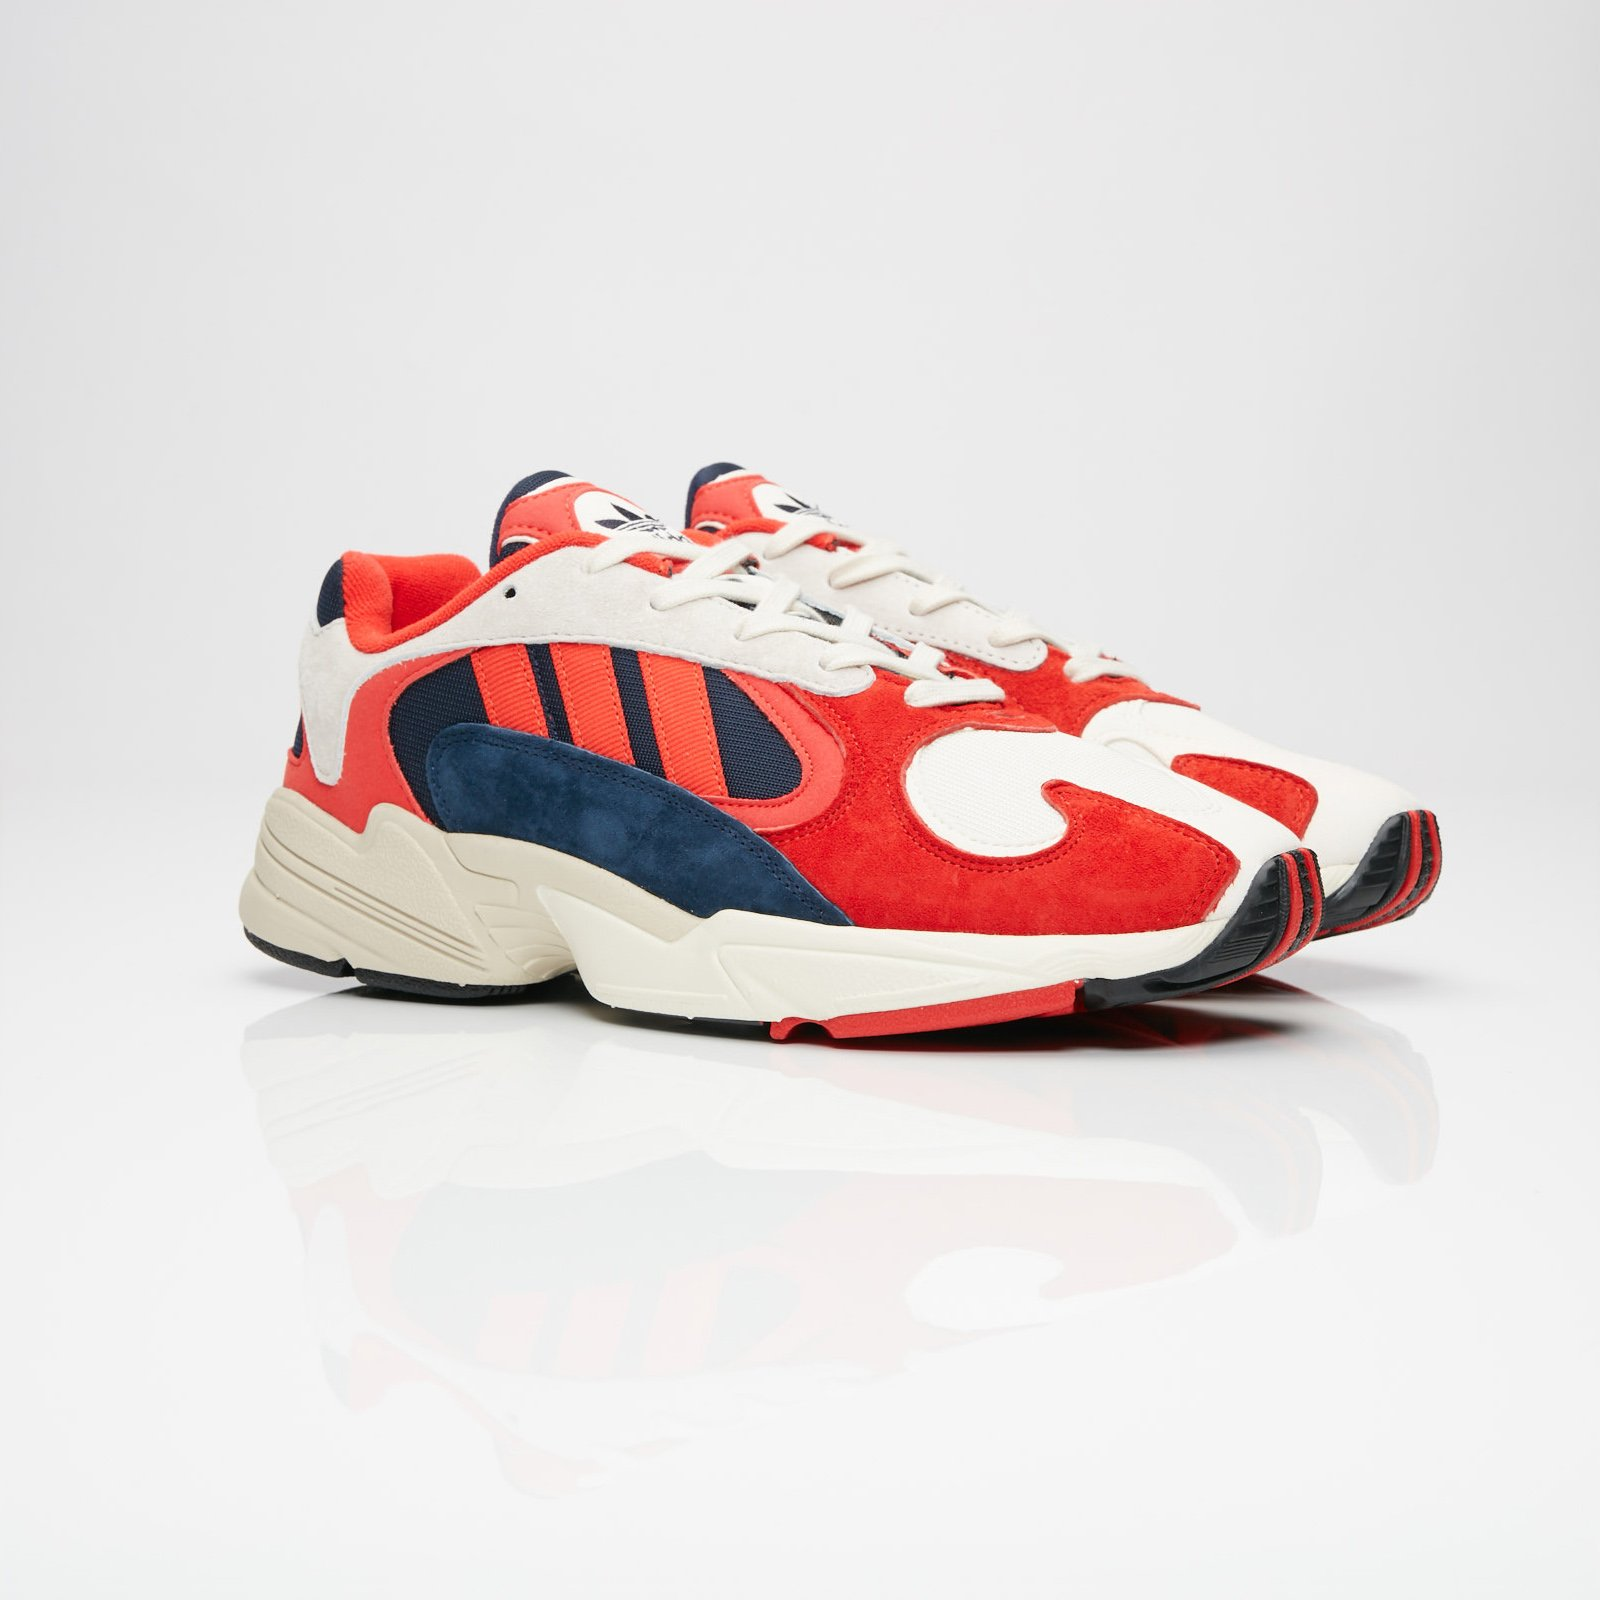 adidas Yung-1 - B37615 - Sneakersnstuff